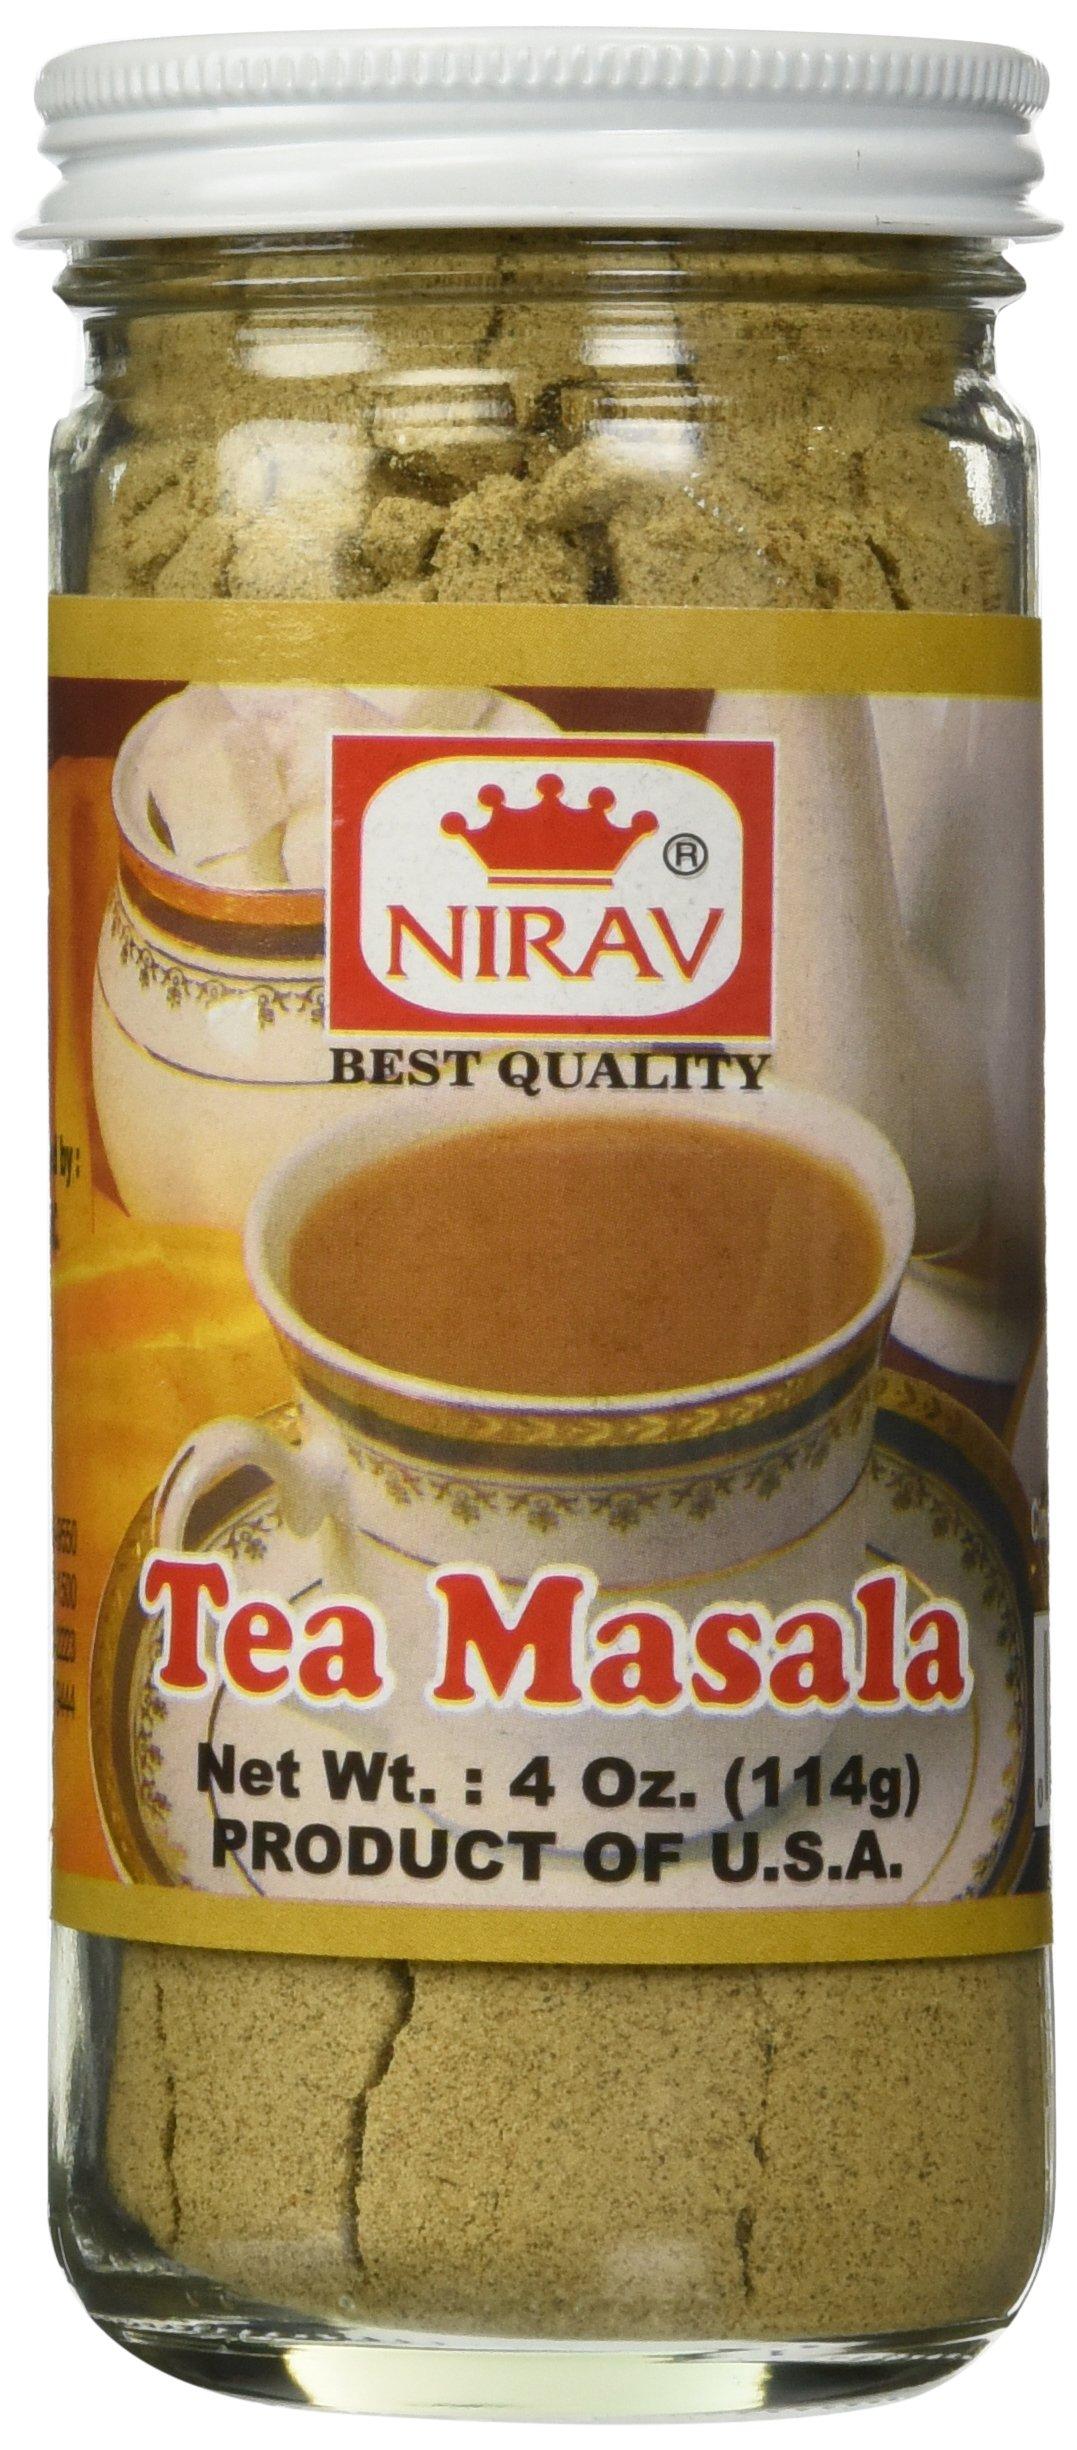 Nirav Tea Masala 4 oz - Ginger, Cinnamon, Cardamom by Nirav (Image #1)